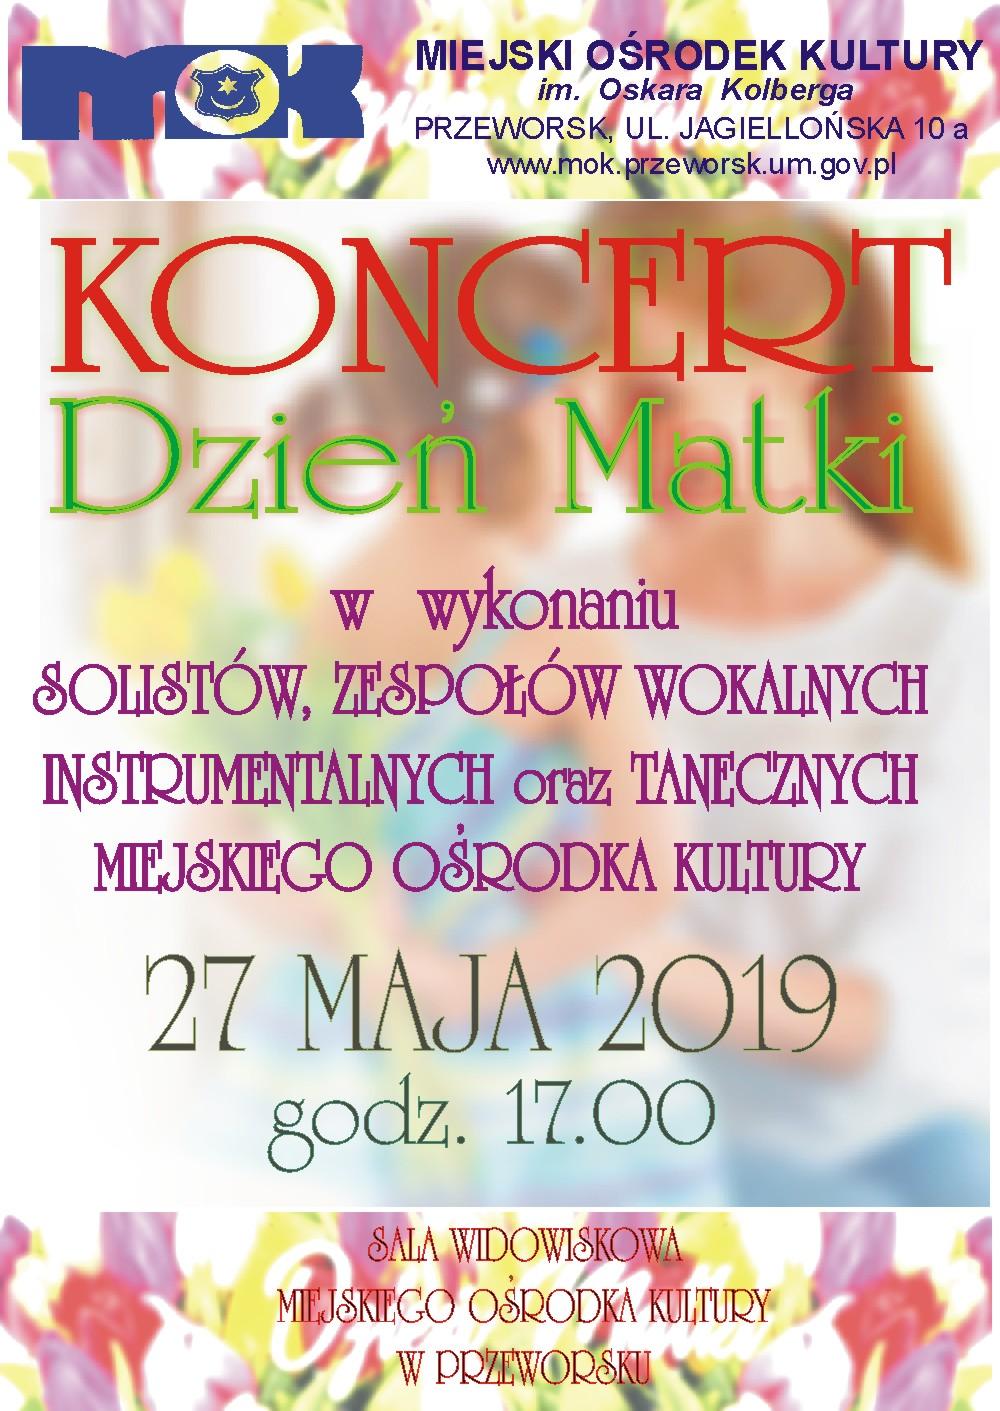 Koncert DZIEŃ MATKI 2019